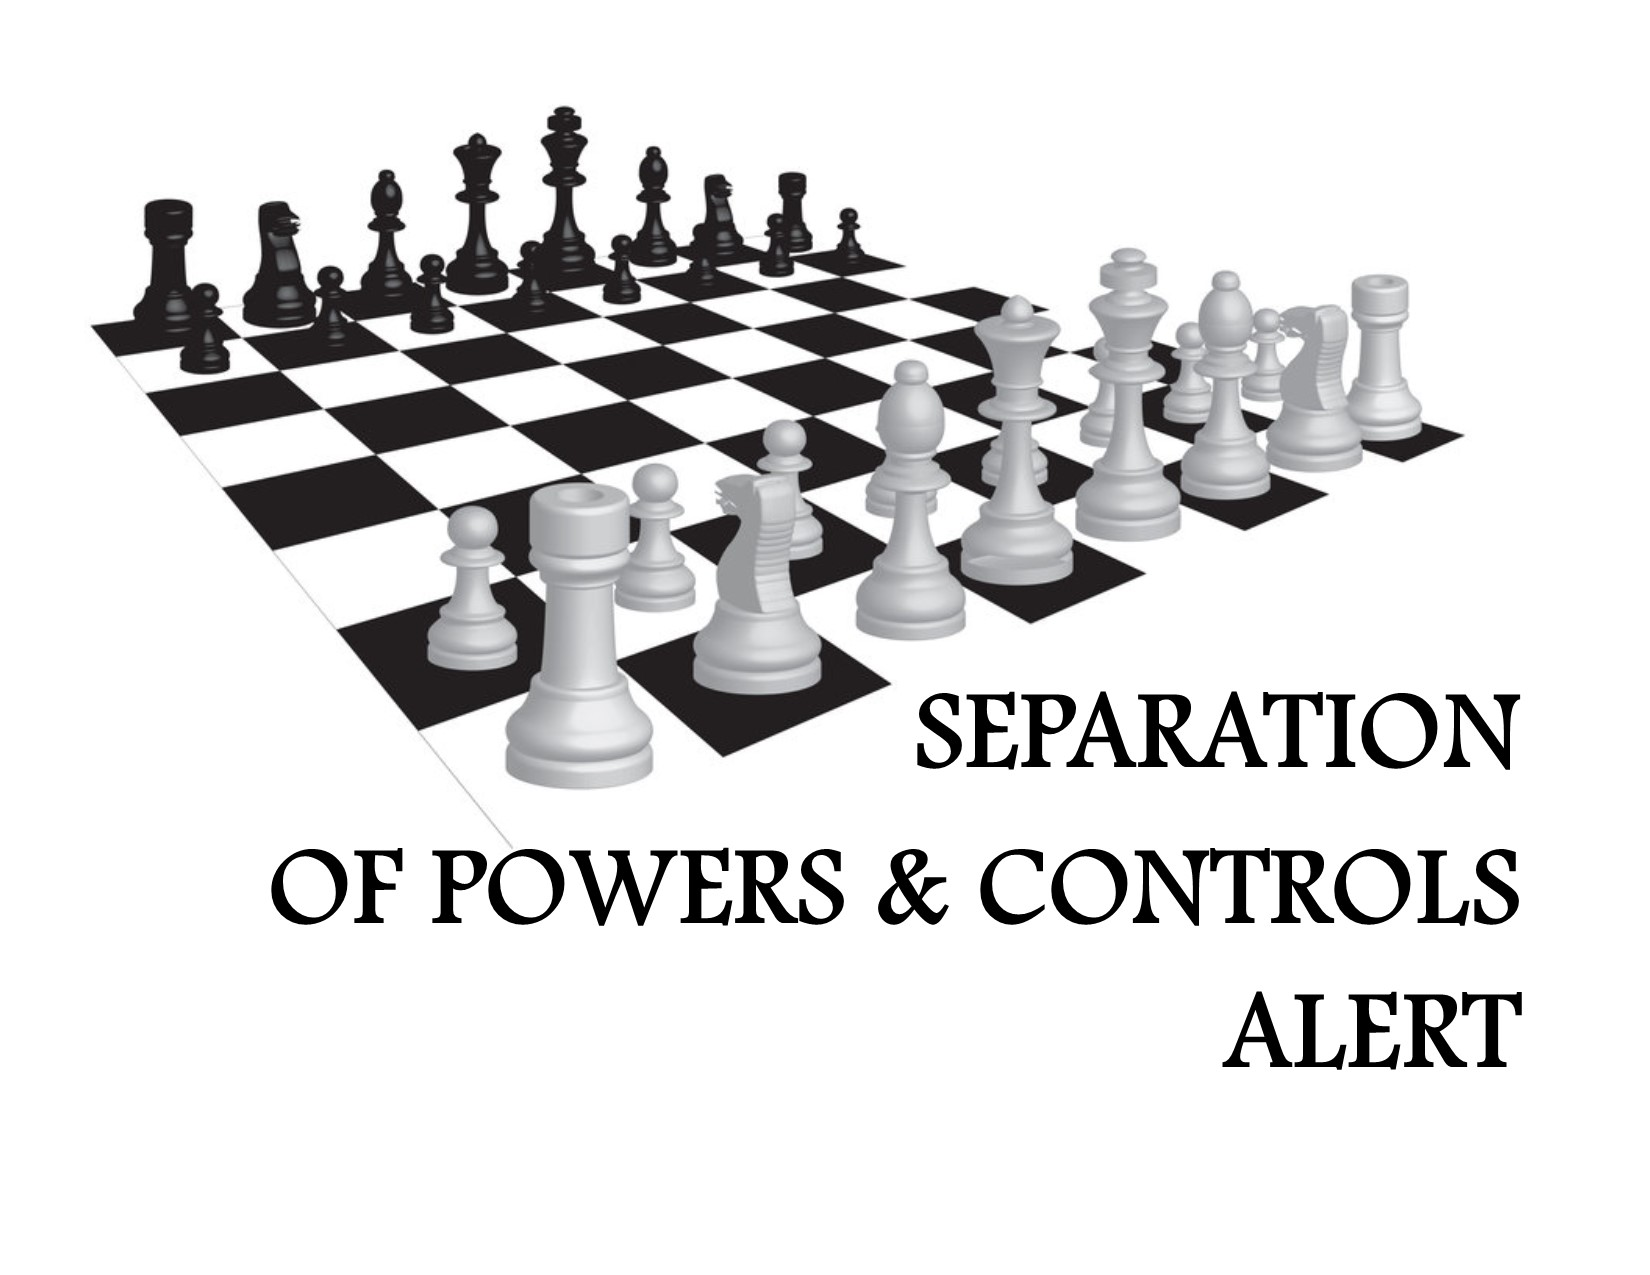 SEPARATION OF POWERS & CONTROLS ALERT: Split the 9th Circuit